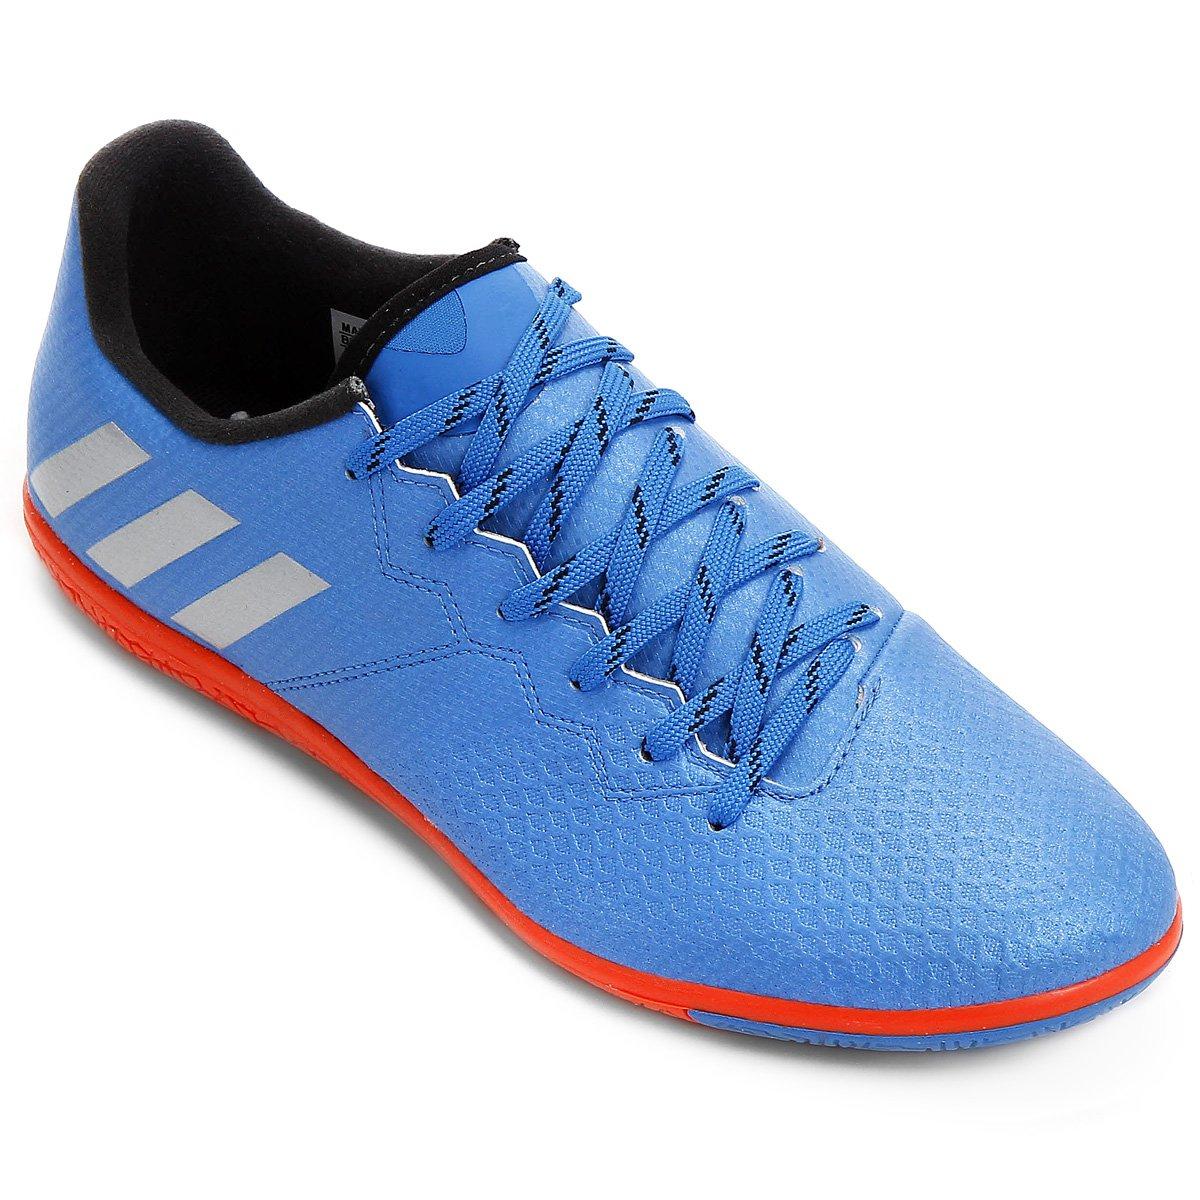 Chuteira Azul 16 e Messi Adidas Masculina IN Prata Futsal 3 v7gvr6